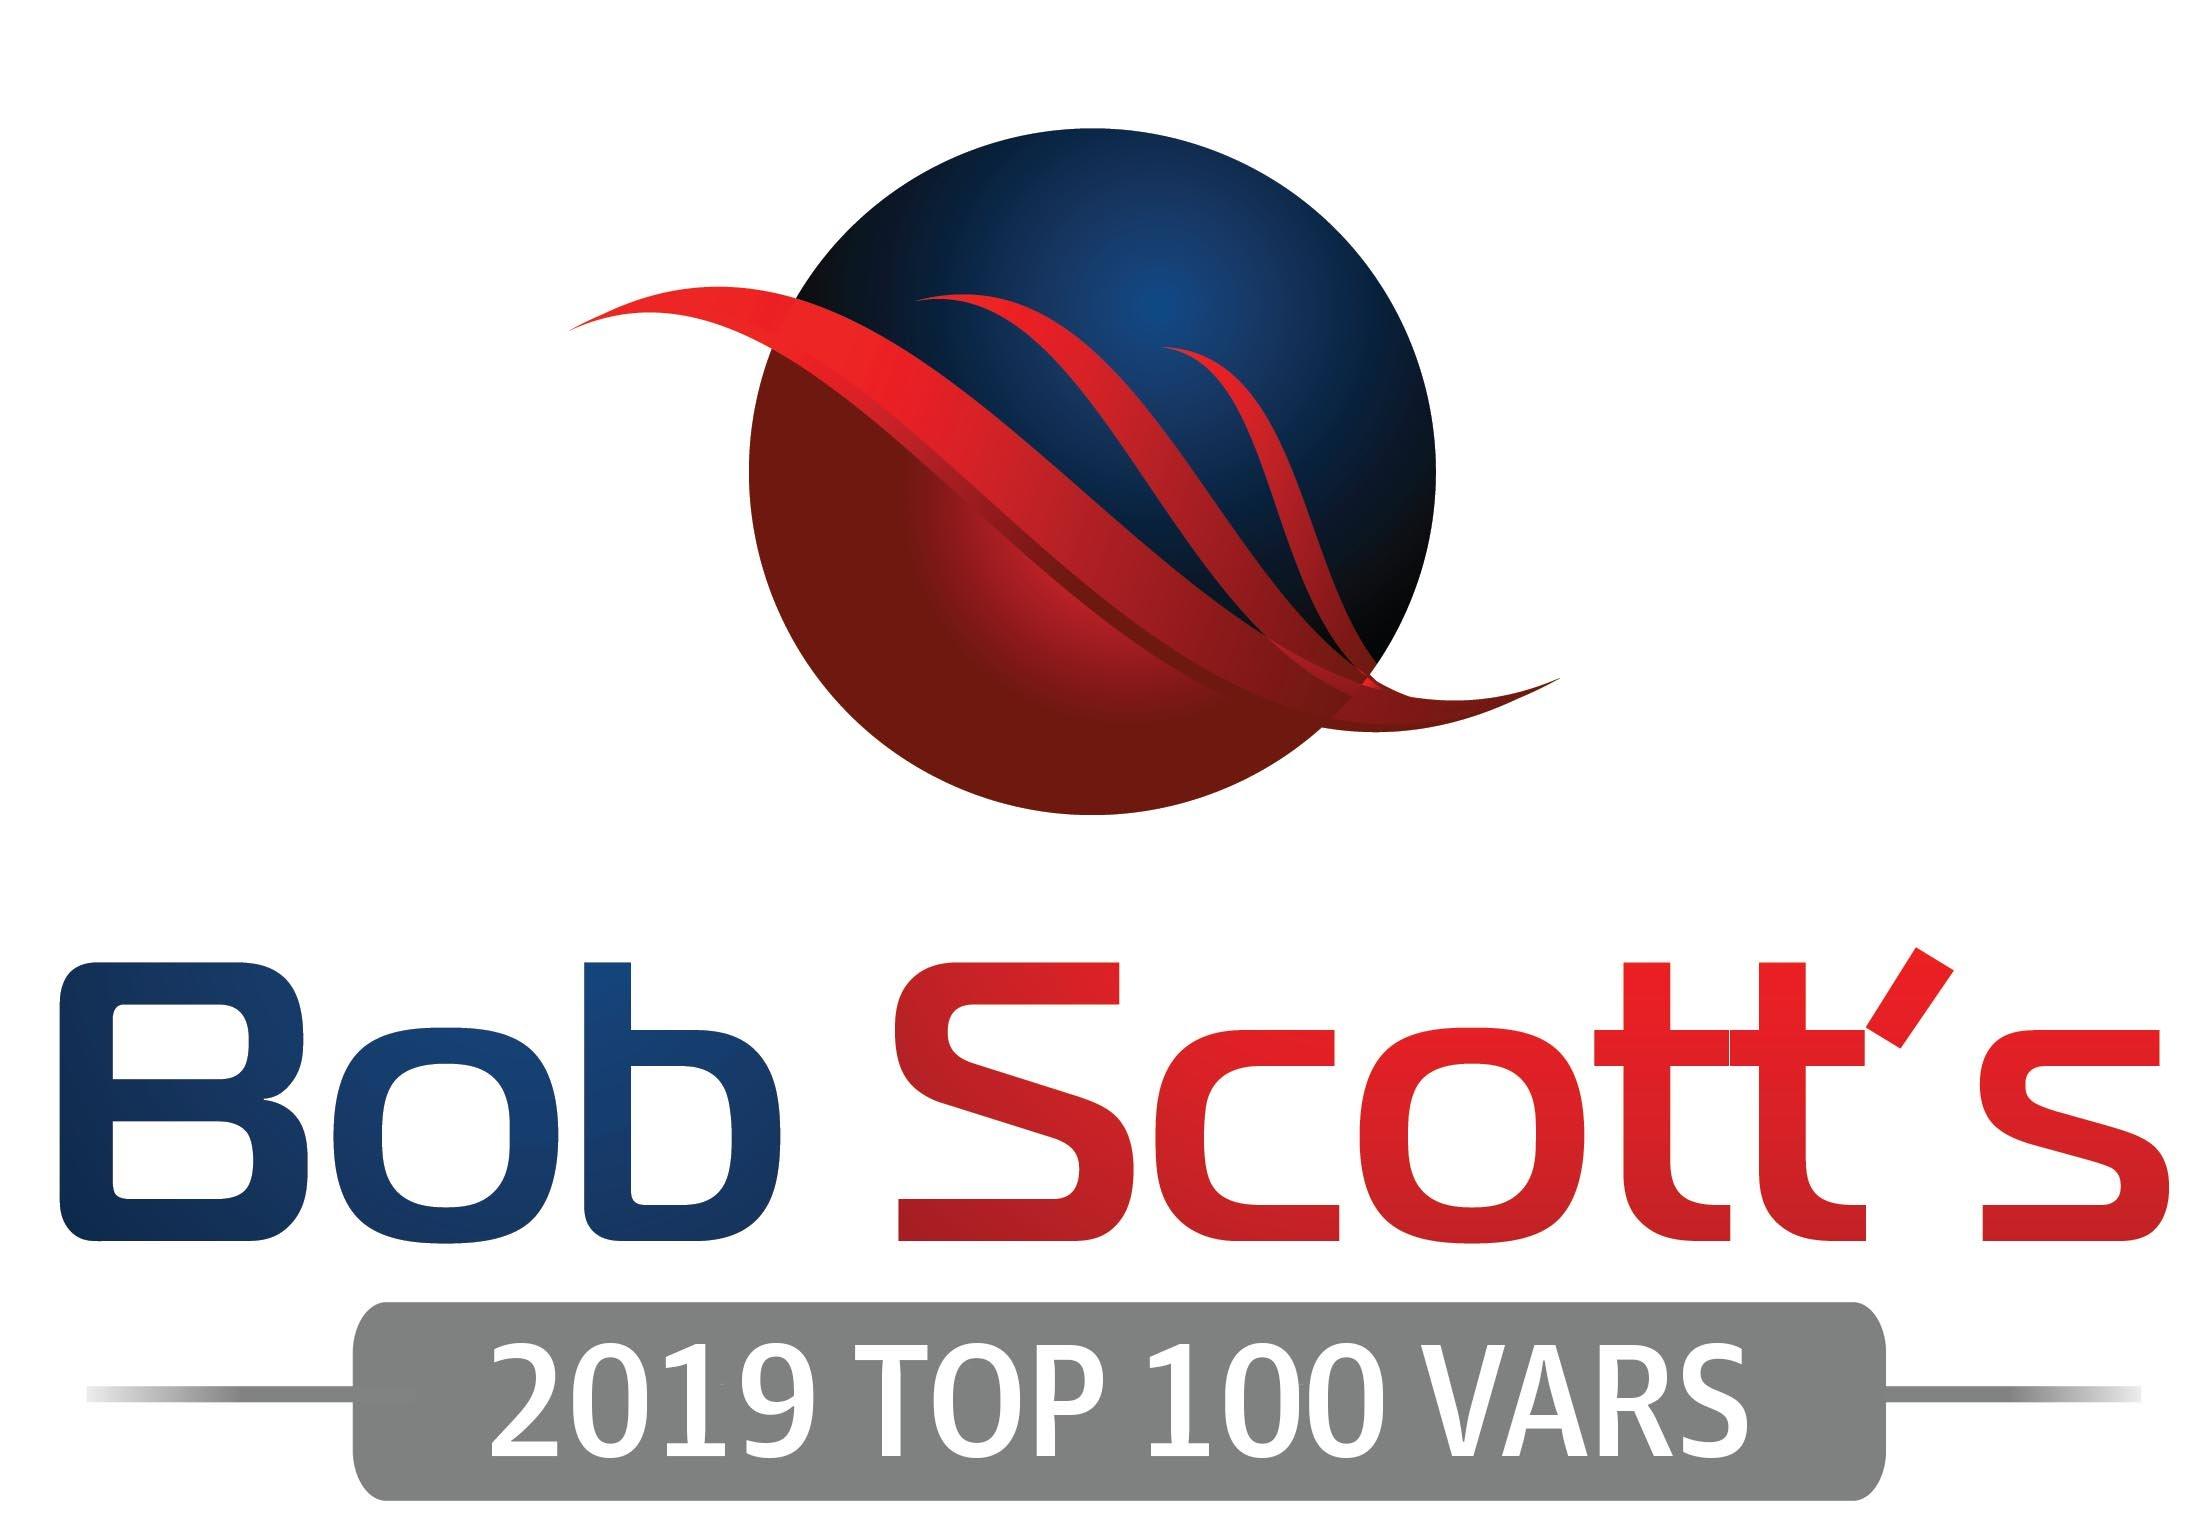 Bob Scott Top 100 VAR 2019